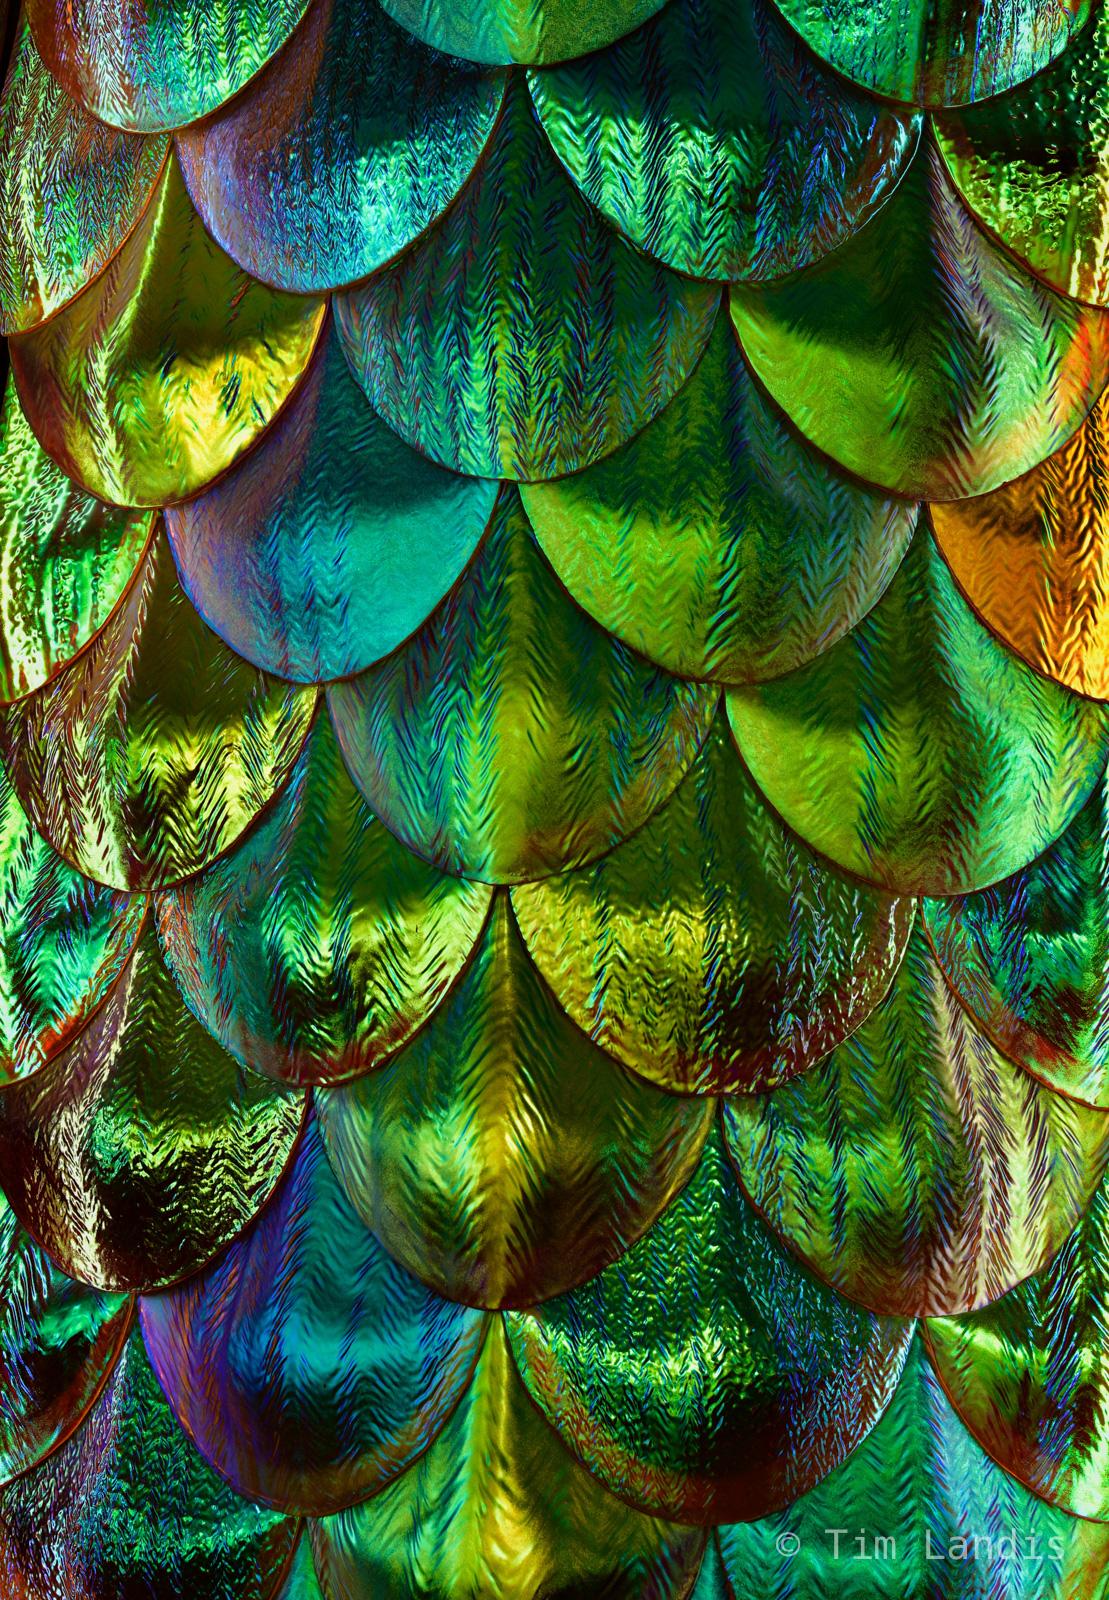 Mermaid scales, iridescent scales, photo